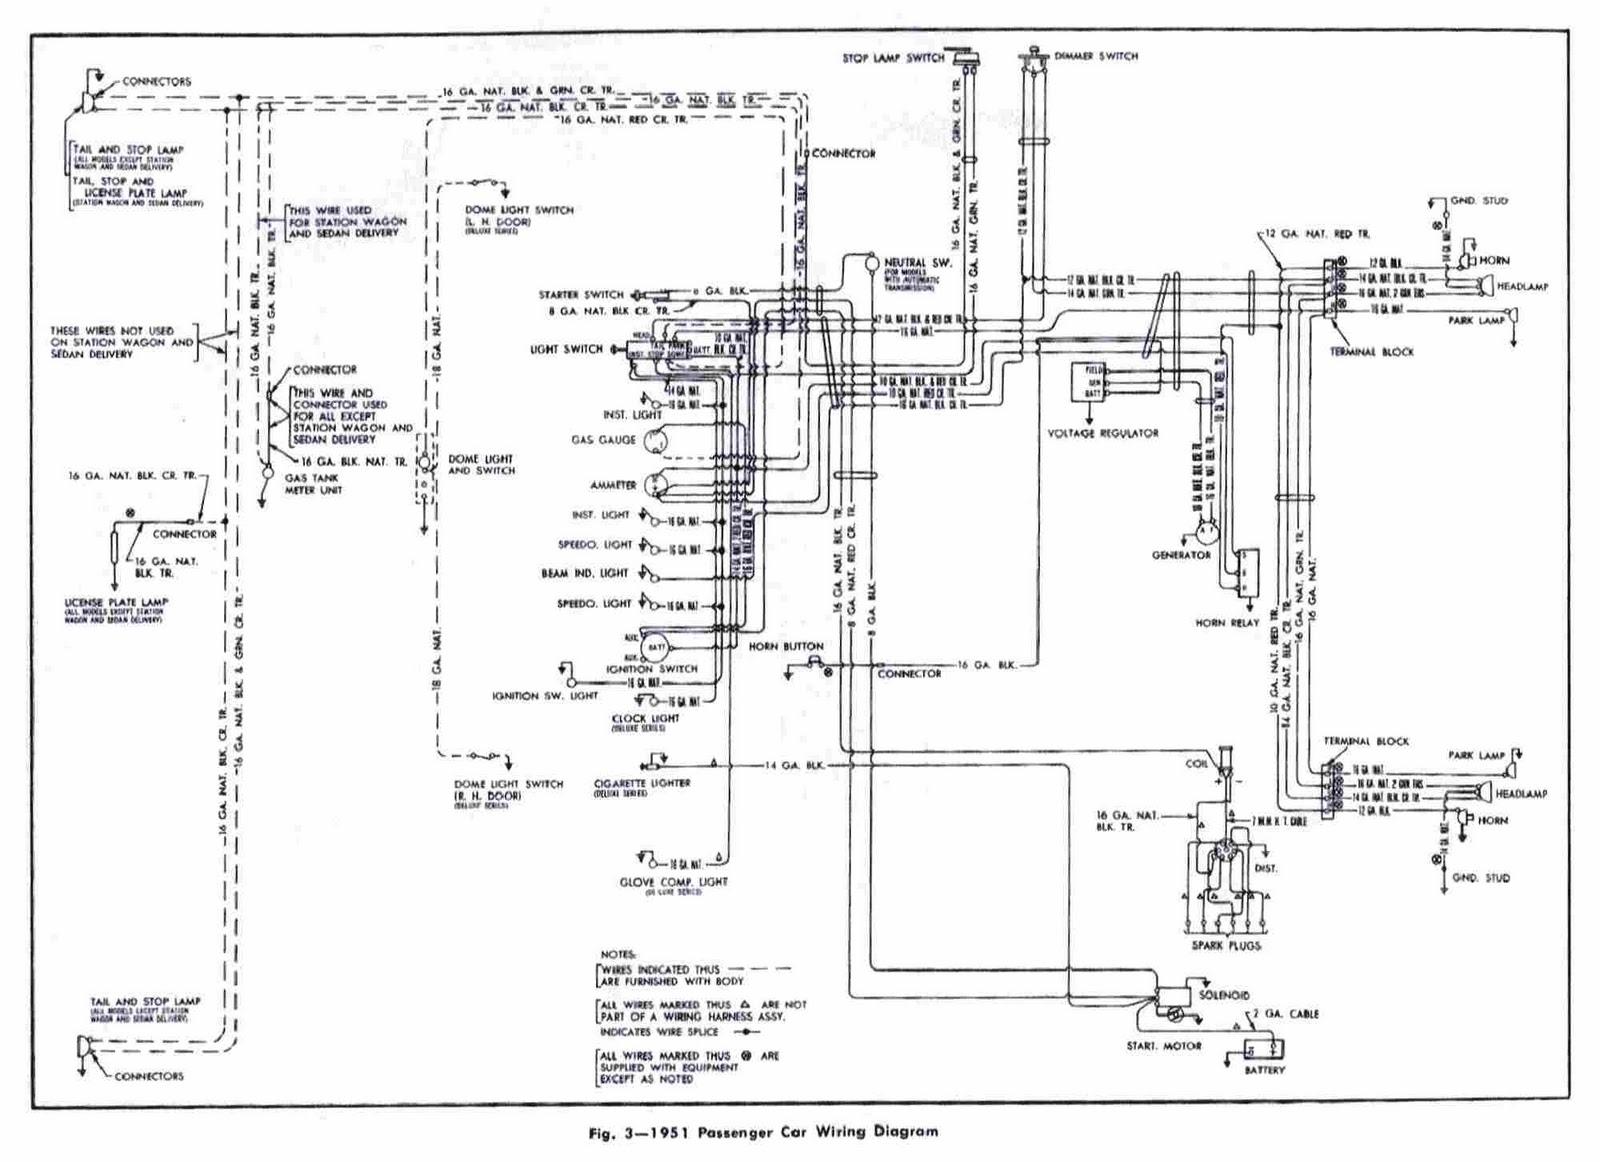 Chevrolet Passenger Car 1951 Wiring Diagram